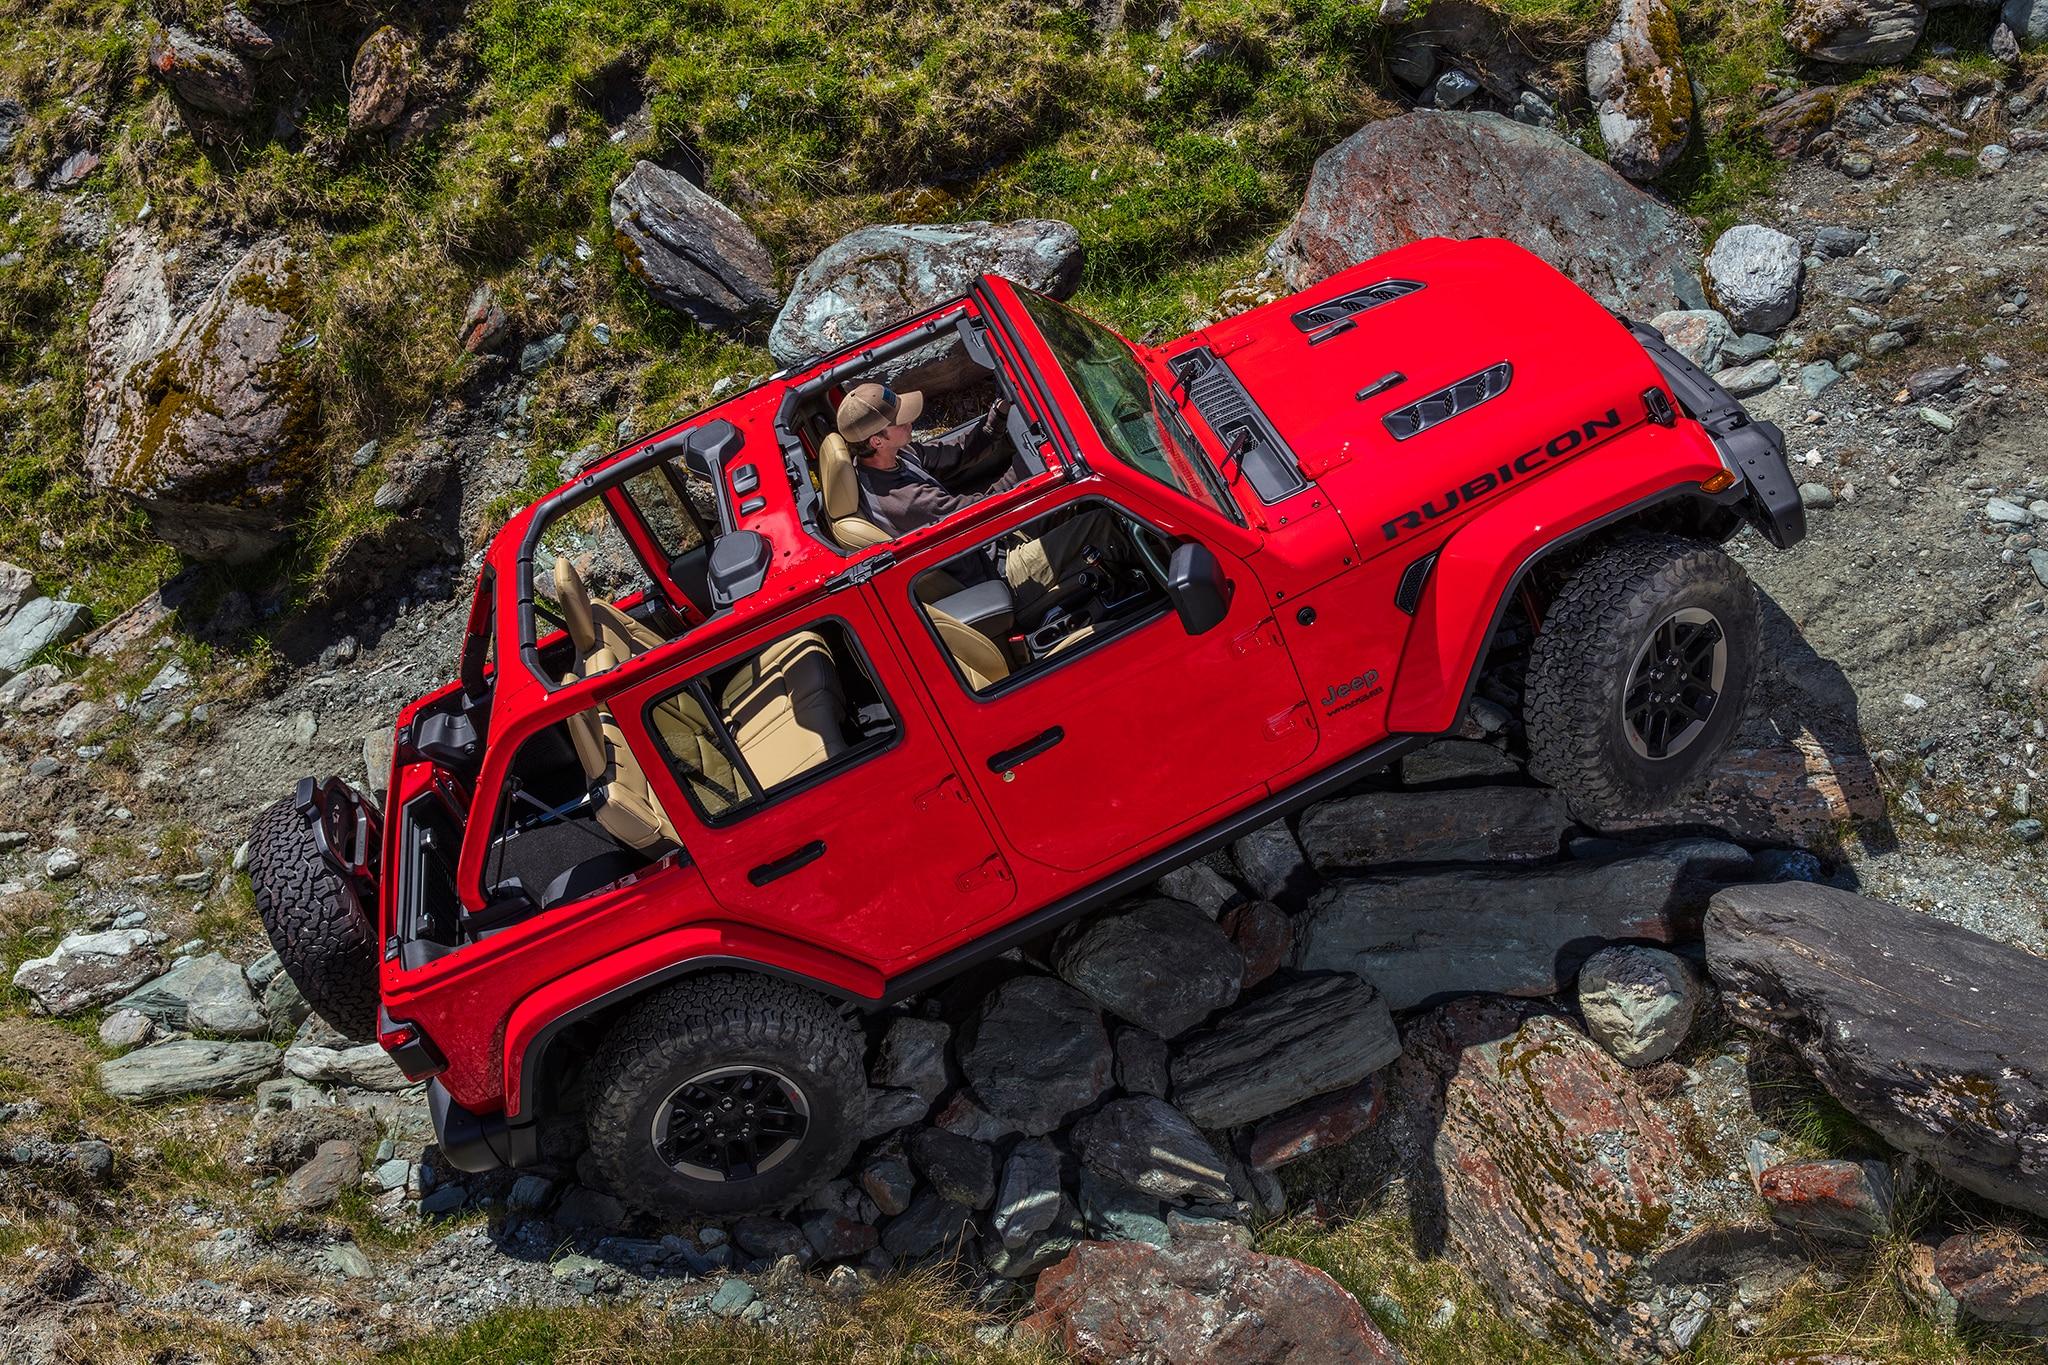 2018 Jeep Wrangler Unlimited Rubicon Side Profile 01